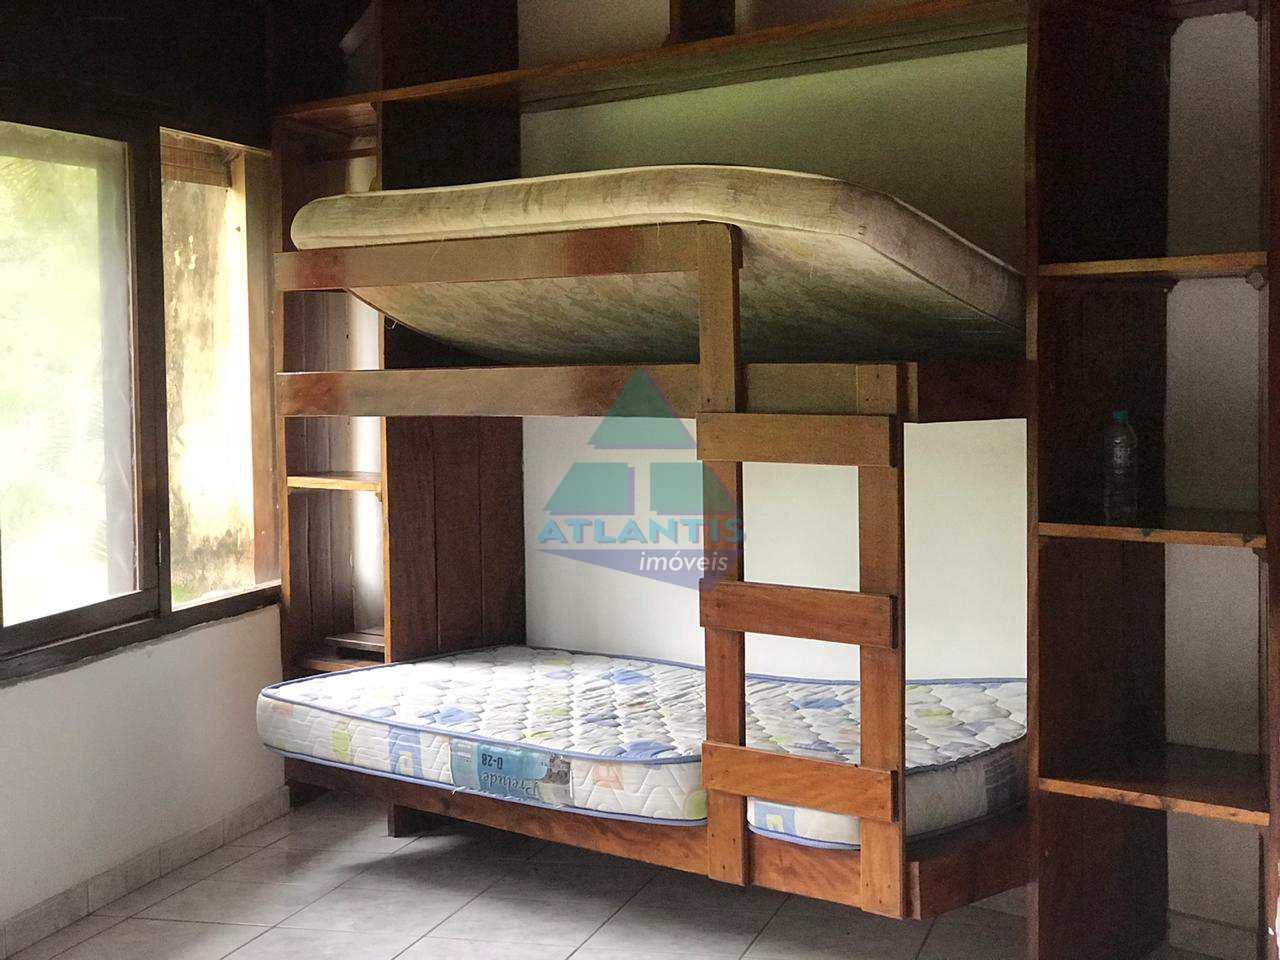 Casa com 1 dorm, Condomínio Lagoinha, Ubatuba - R$ 830 mil, Cod: 1179